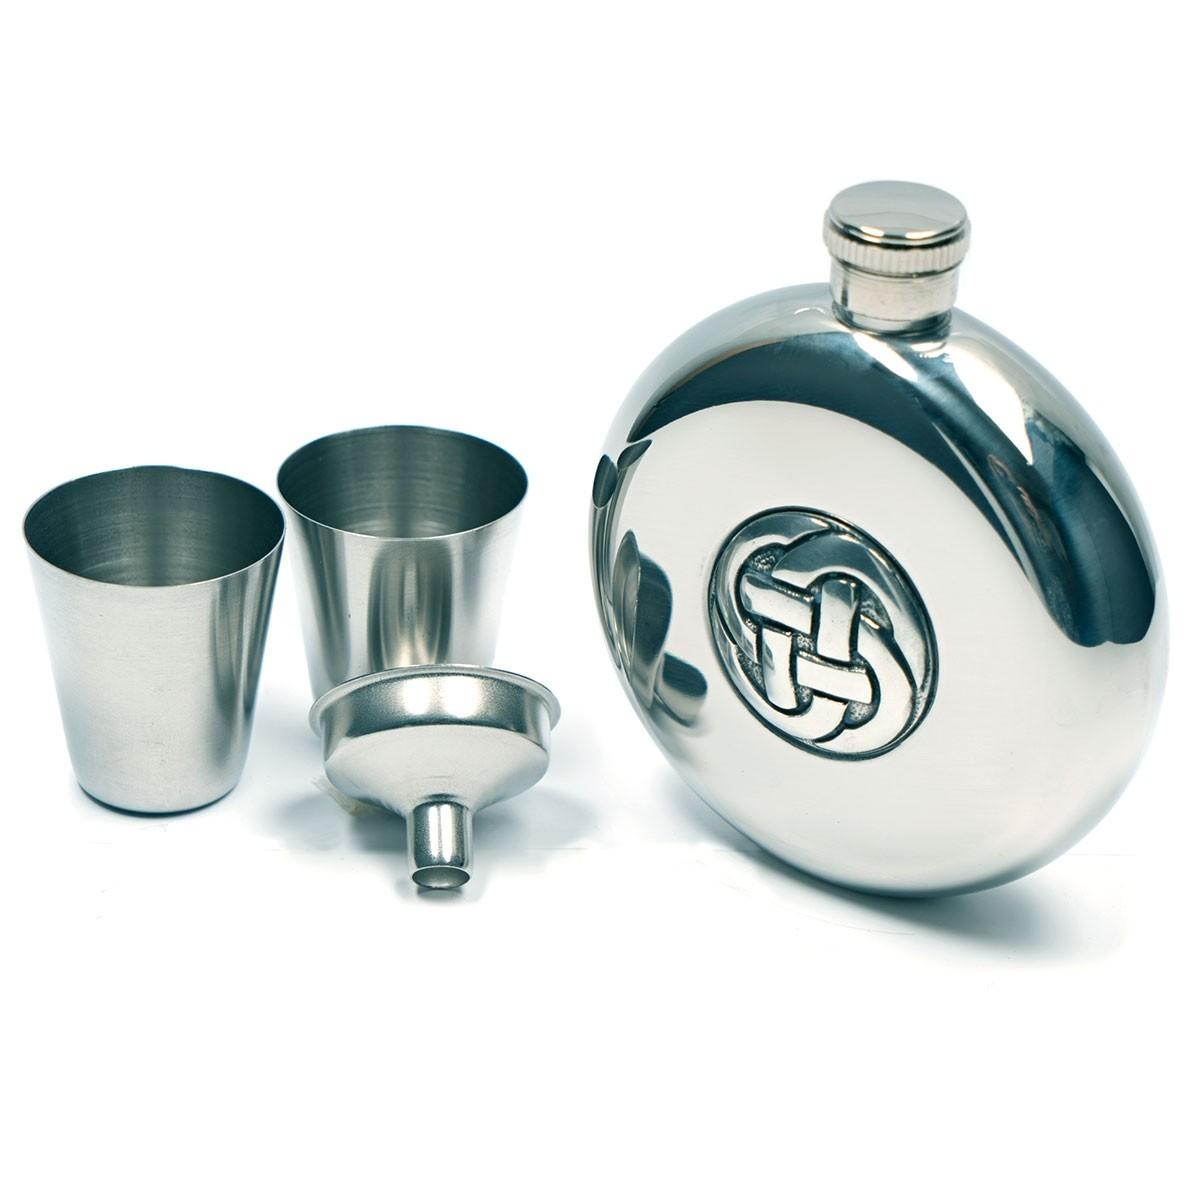 Hip Flask with Celtic Knot Design